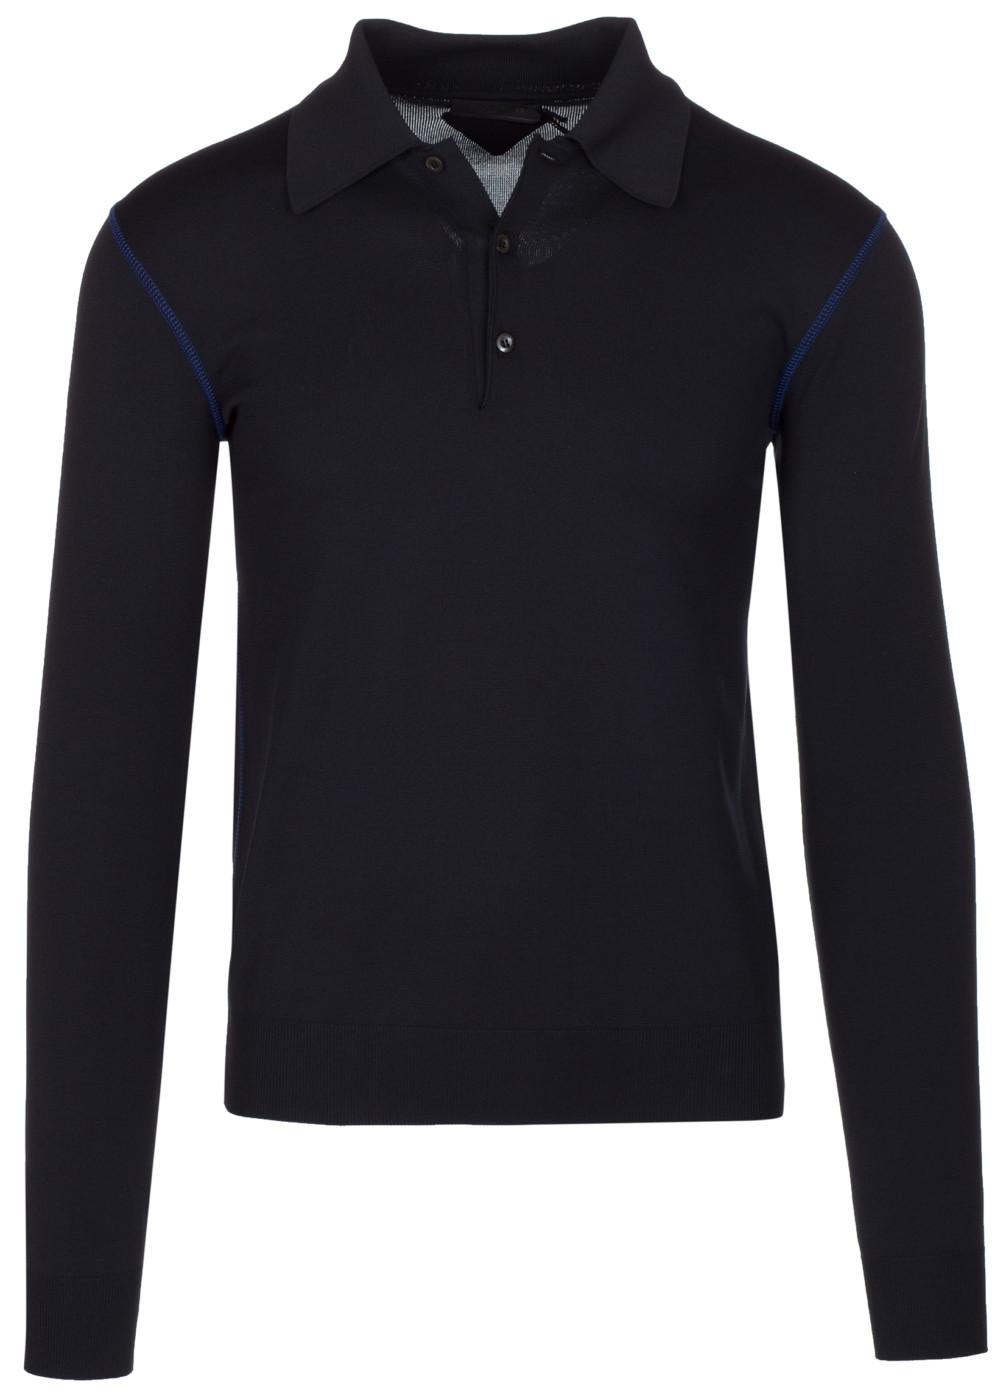 4fd9bc1e Prada Men's Black Blue Contrast Seam Long Sleeves Polo Shirt